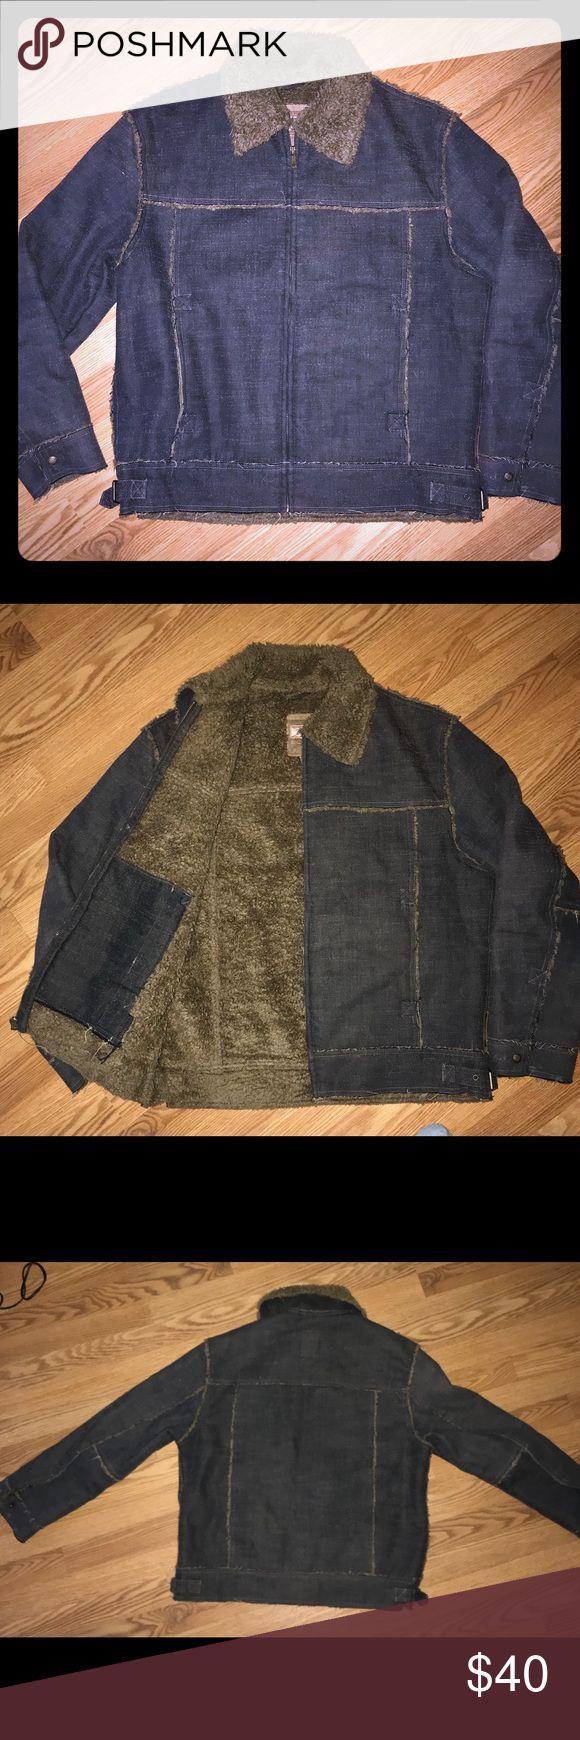 Guess Denim/Shearling Jacket Size Small  Super Warm Machine wash/dry Guess Jackets & Coats Bomber & Varsity